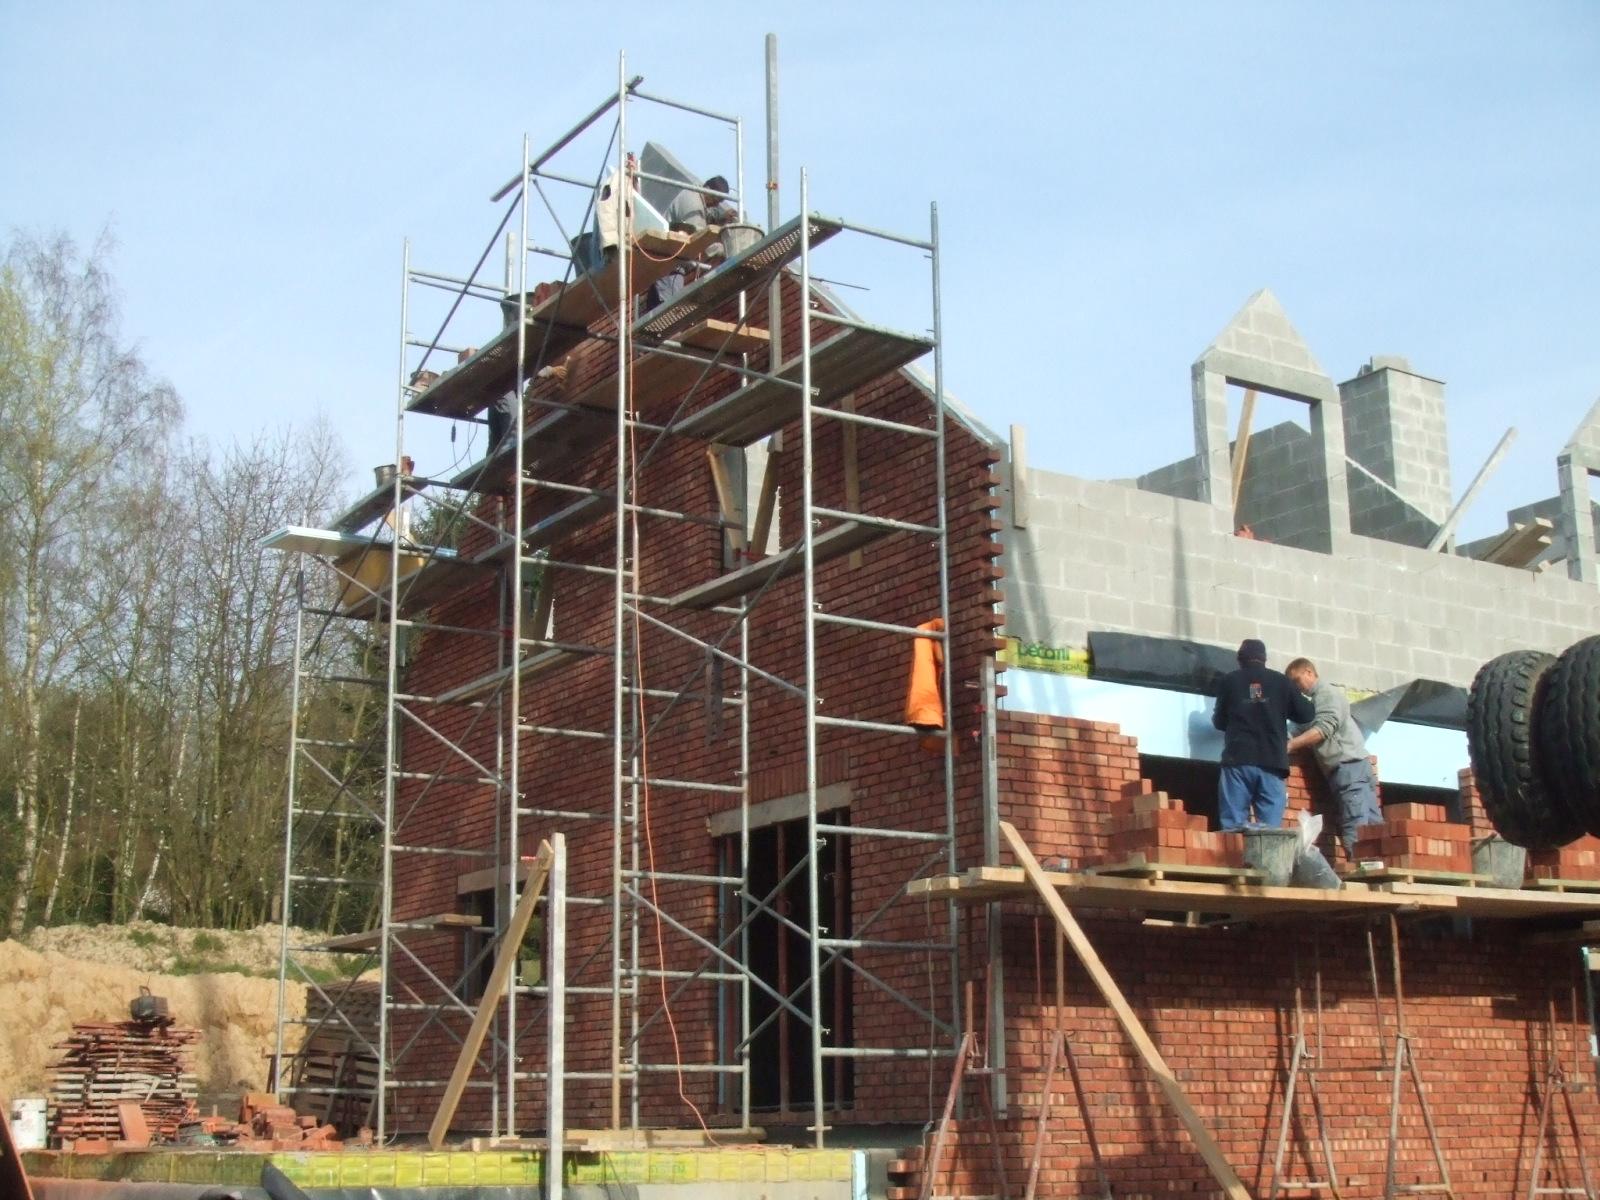 Construction maison neuve brabant wallon for Construction neuve maison